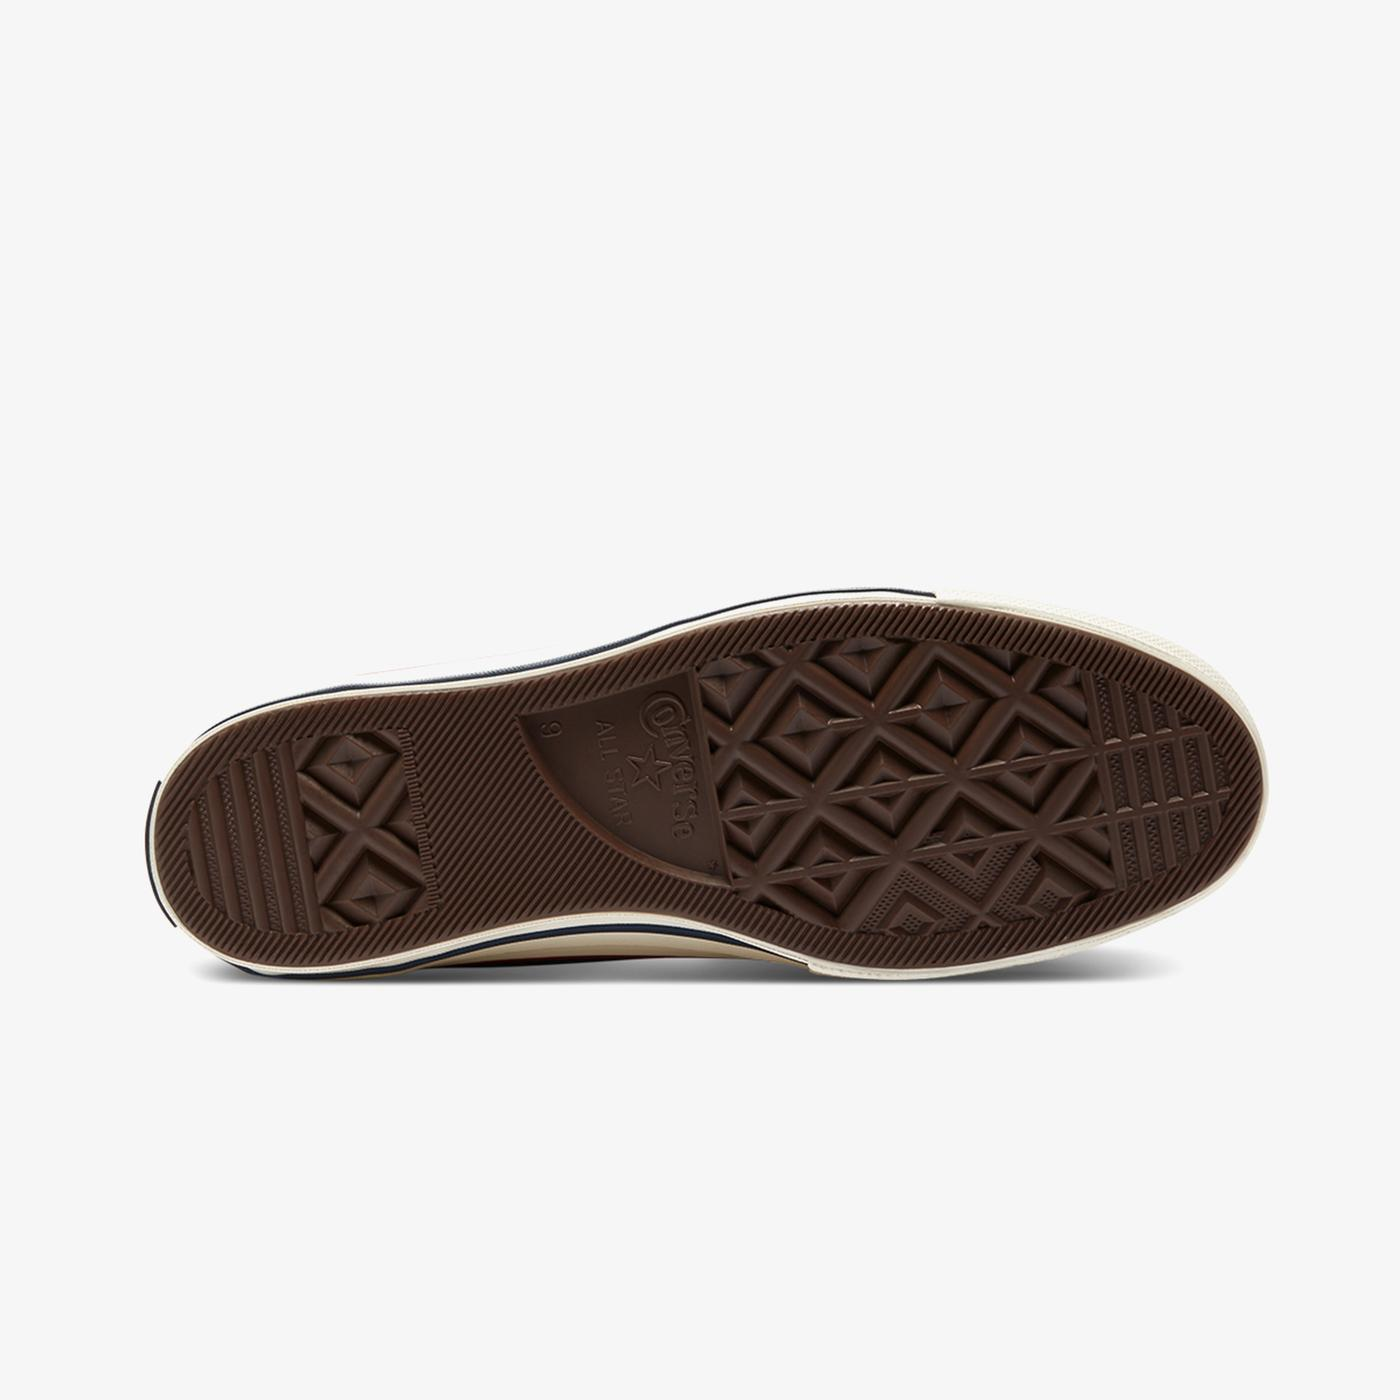 Converse Chuck 70 Premium Leather Hi Erkek Siyah Sneaker